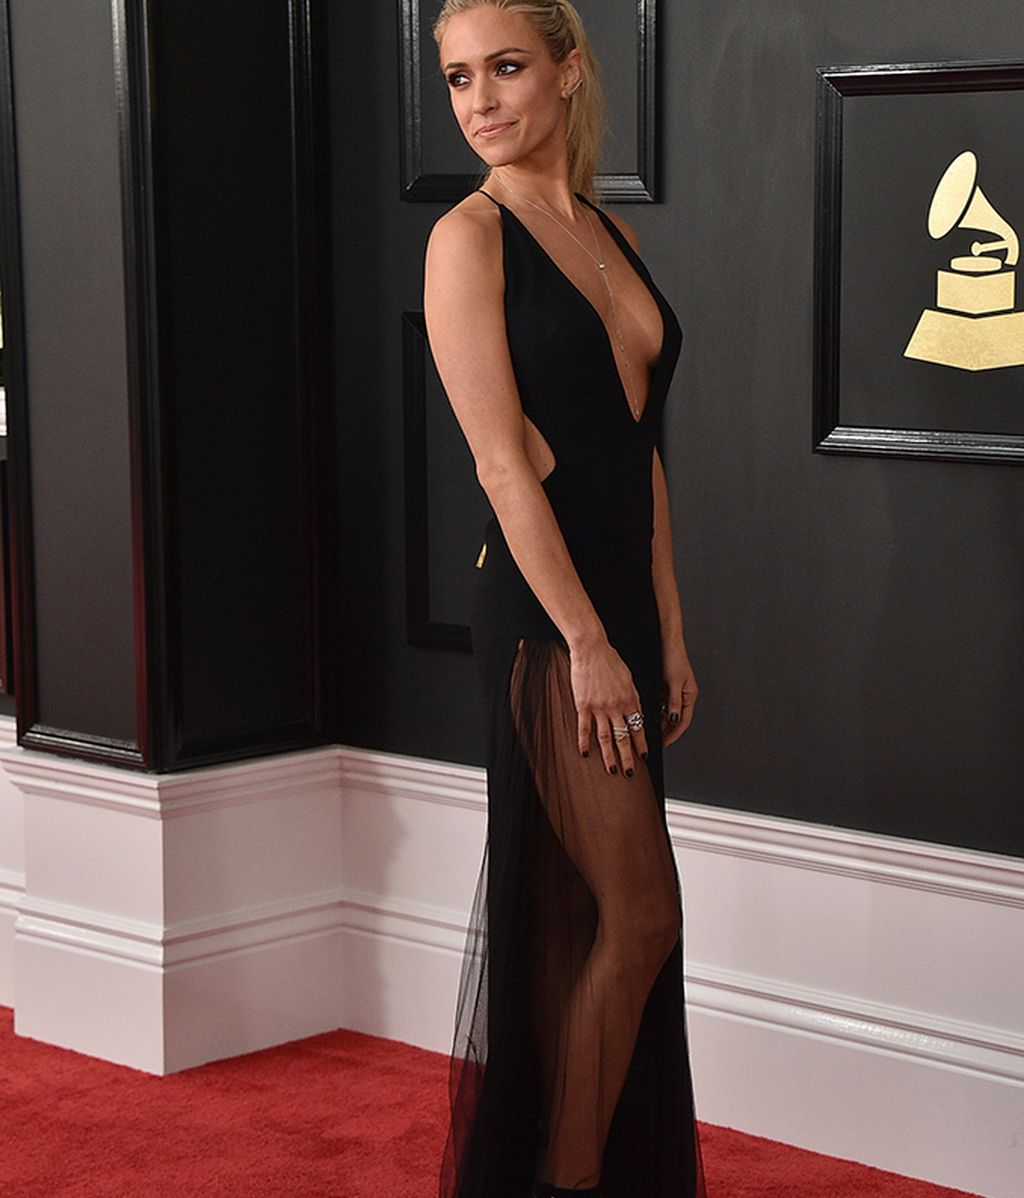 Kristin Cavallari en la alfombra roja